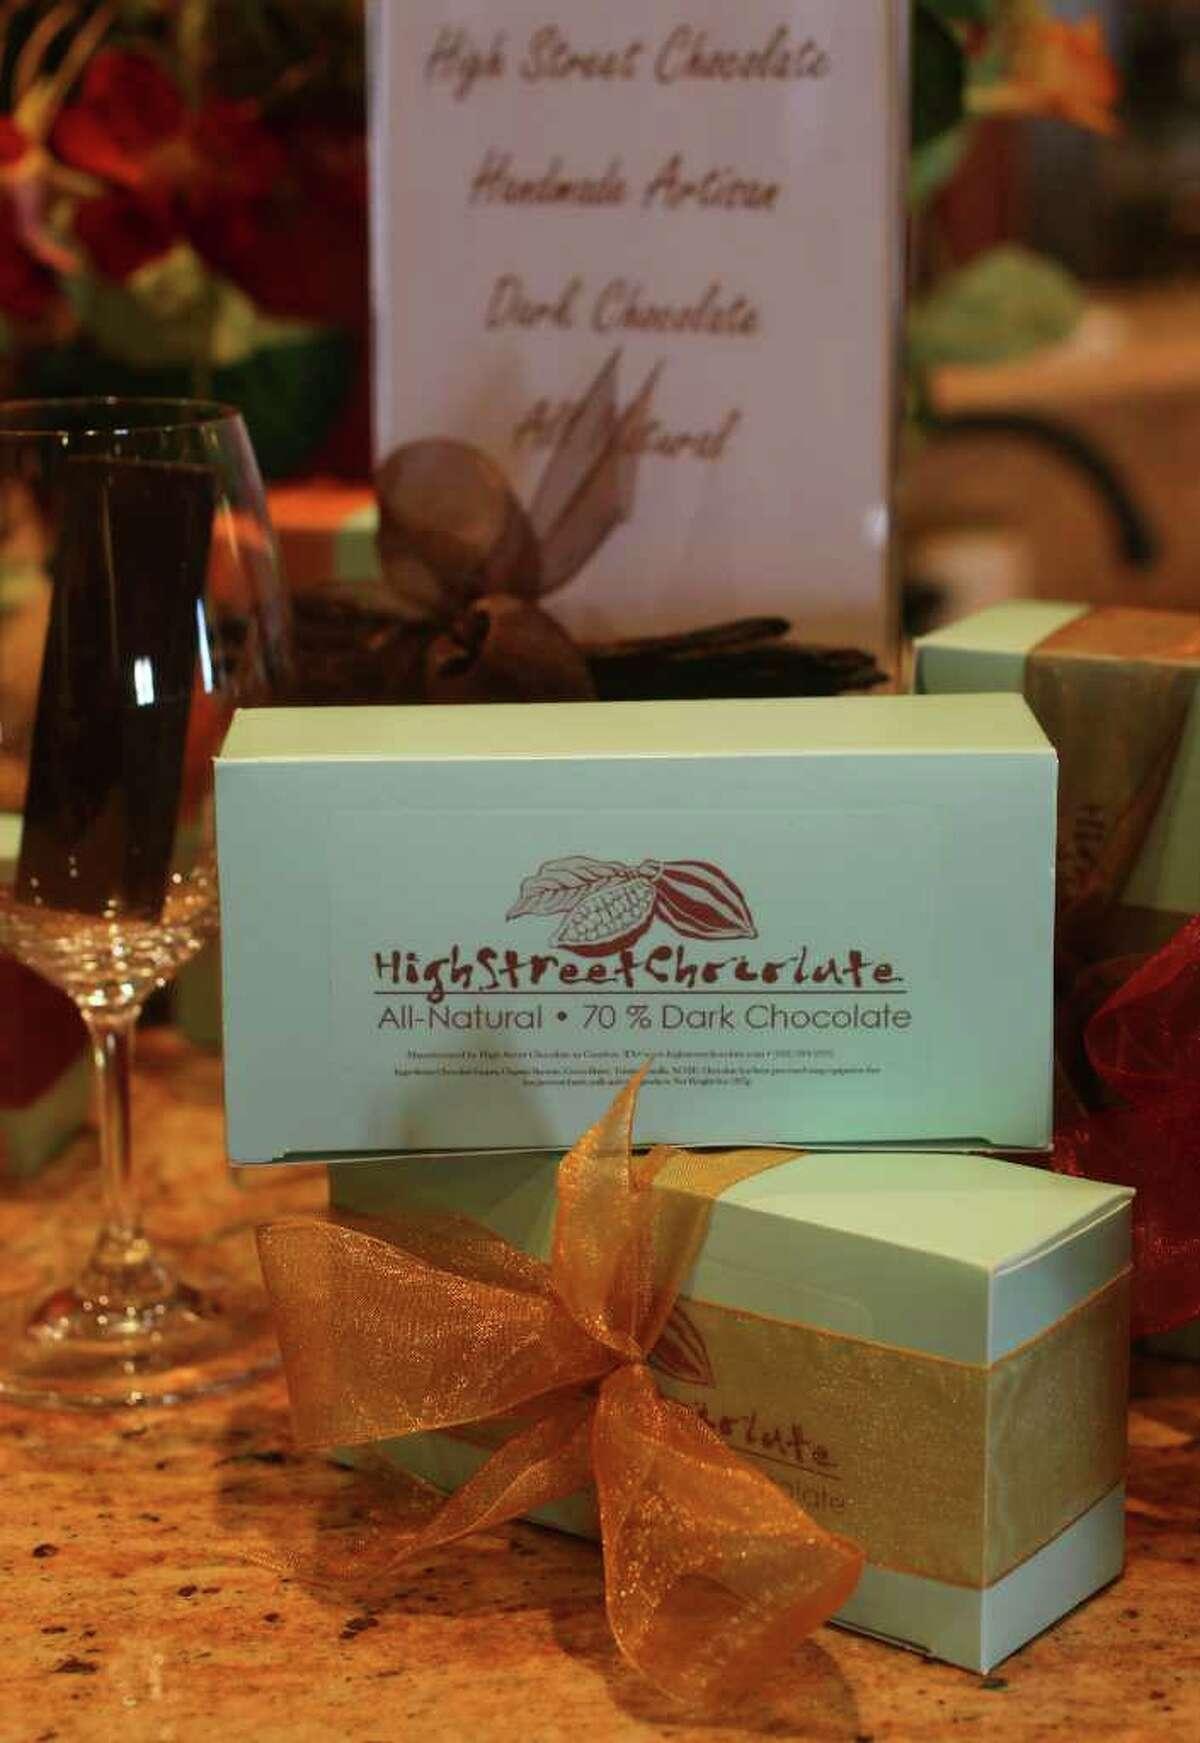 High Street Chocolate comes in five flavors, Tahitian Vanilla, Mandarin, peppermint, lemon and espresso.